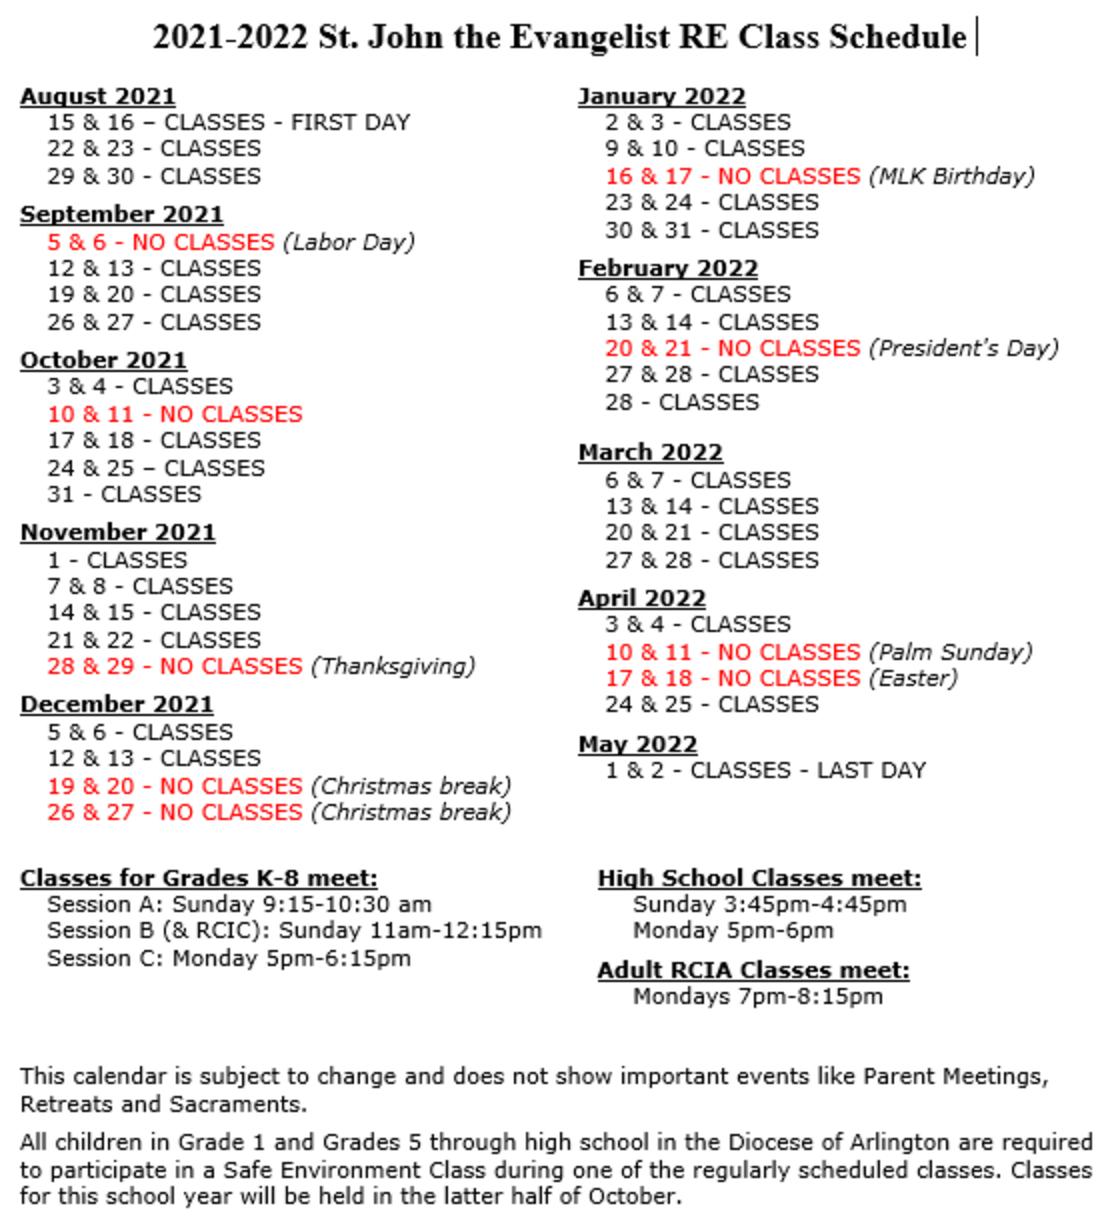 SJE RE 2021 2022 Class Calendar